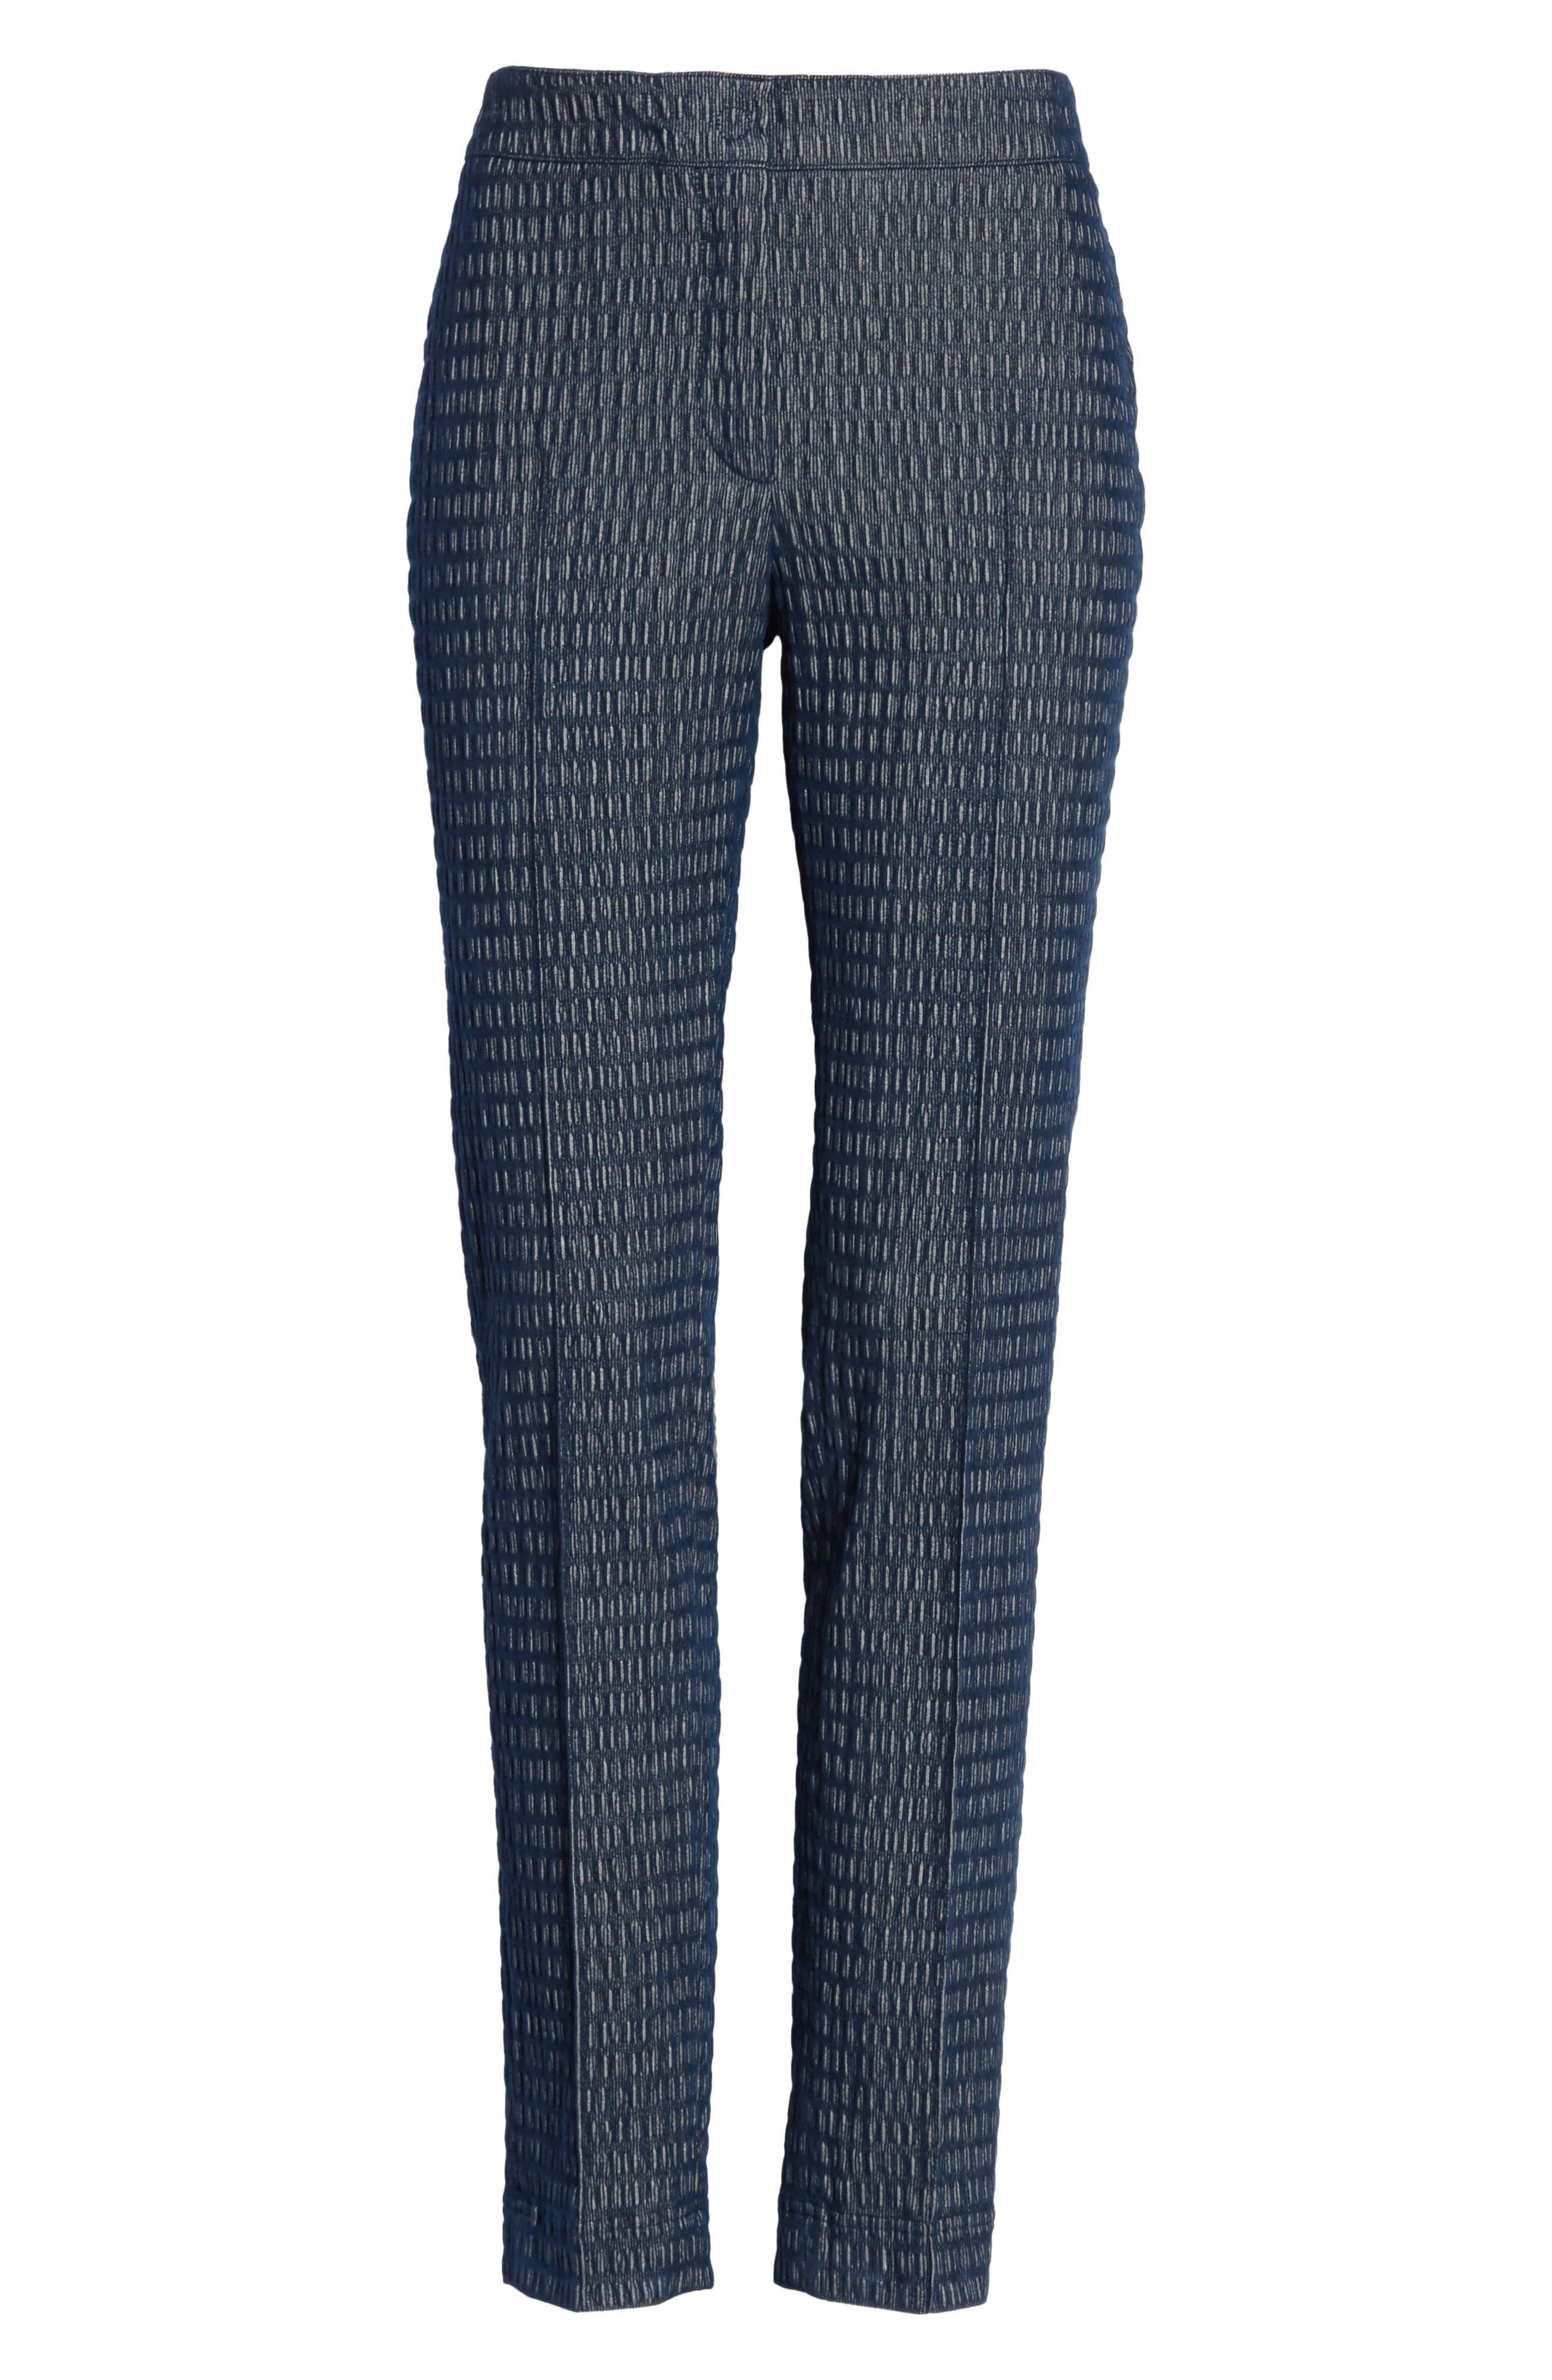 Mara Cloquer Jersey Pants,                             Alternate thumbnail 6, color,                             400